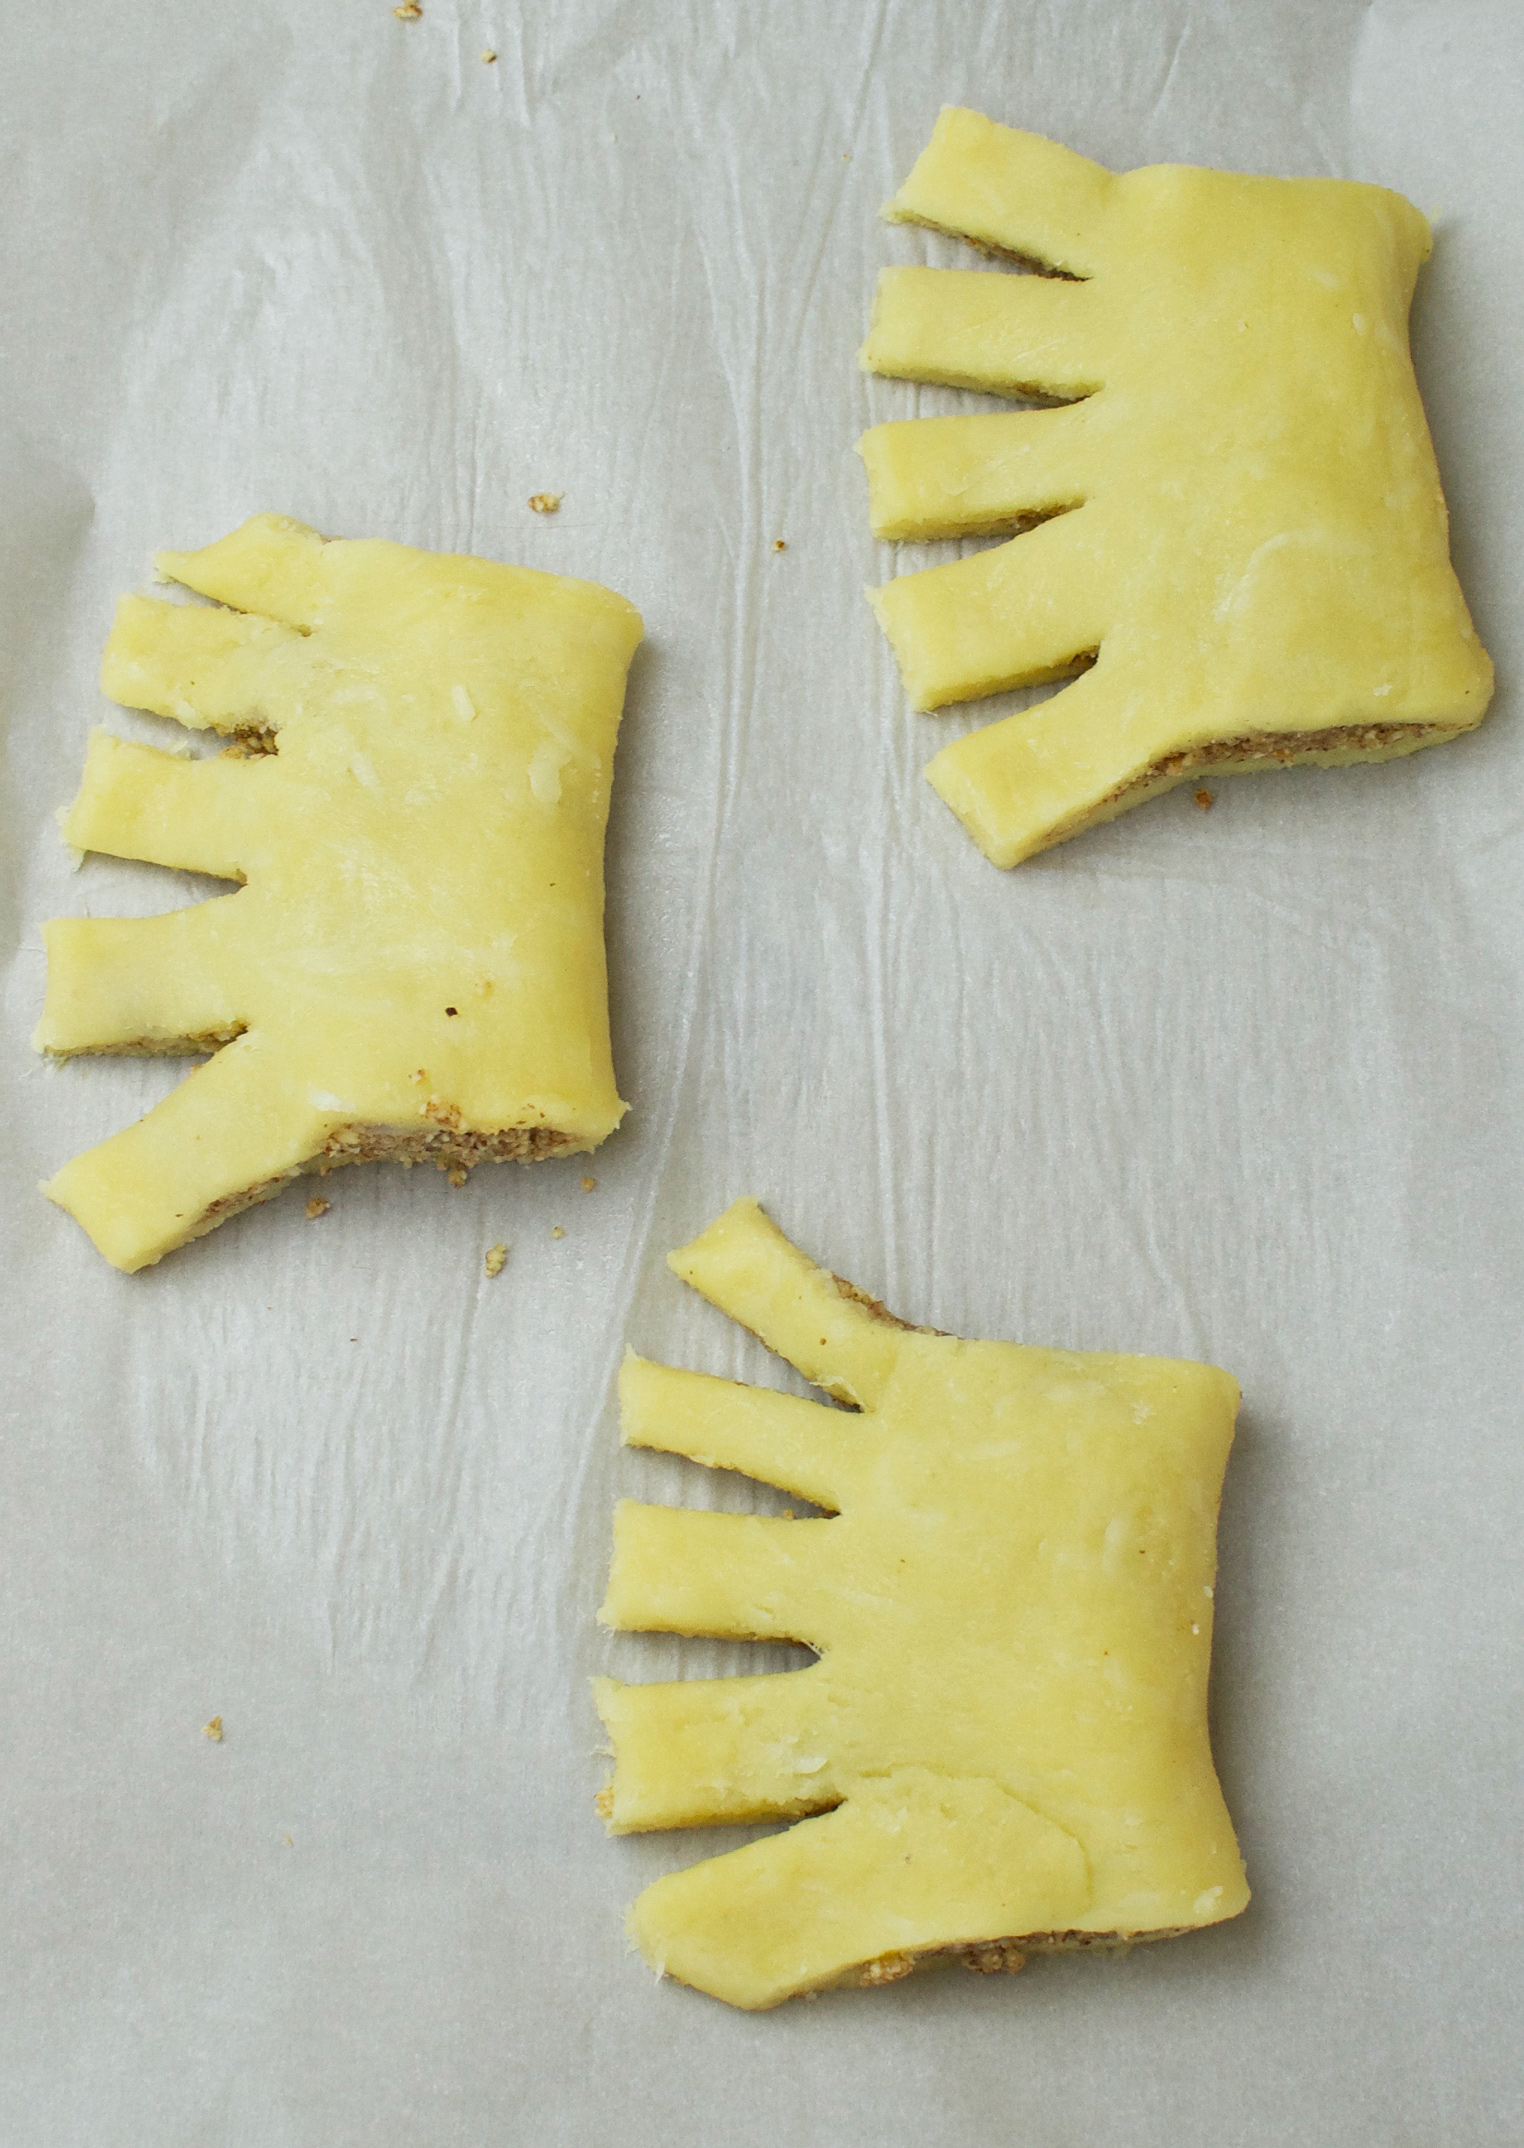 Bear claws arranged on the tray